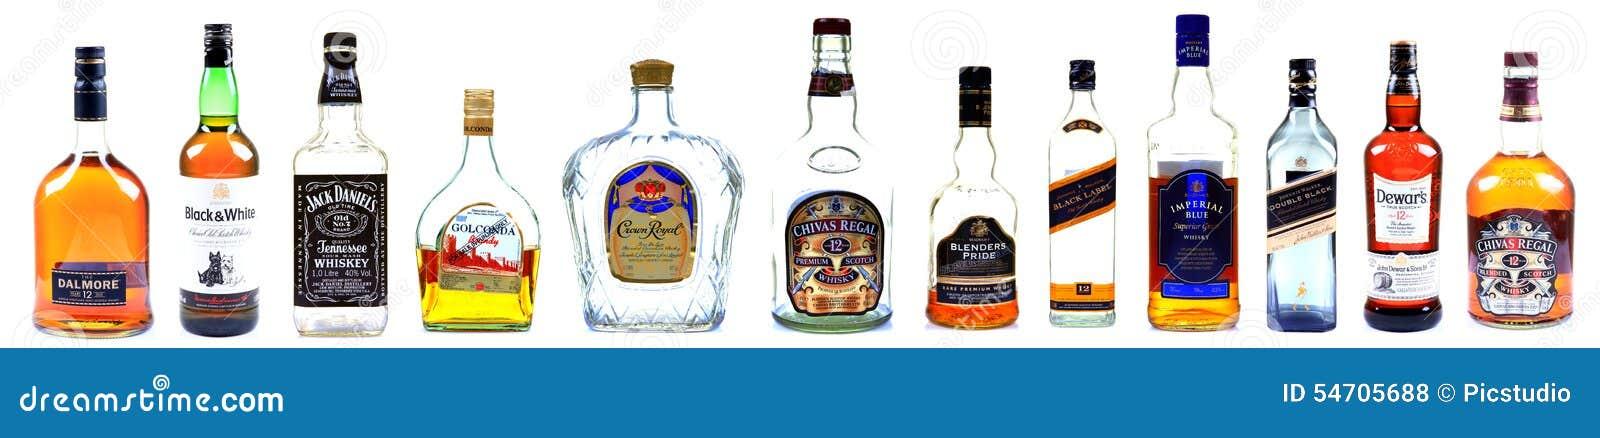 Бутылки вискиа